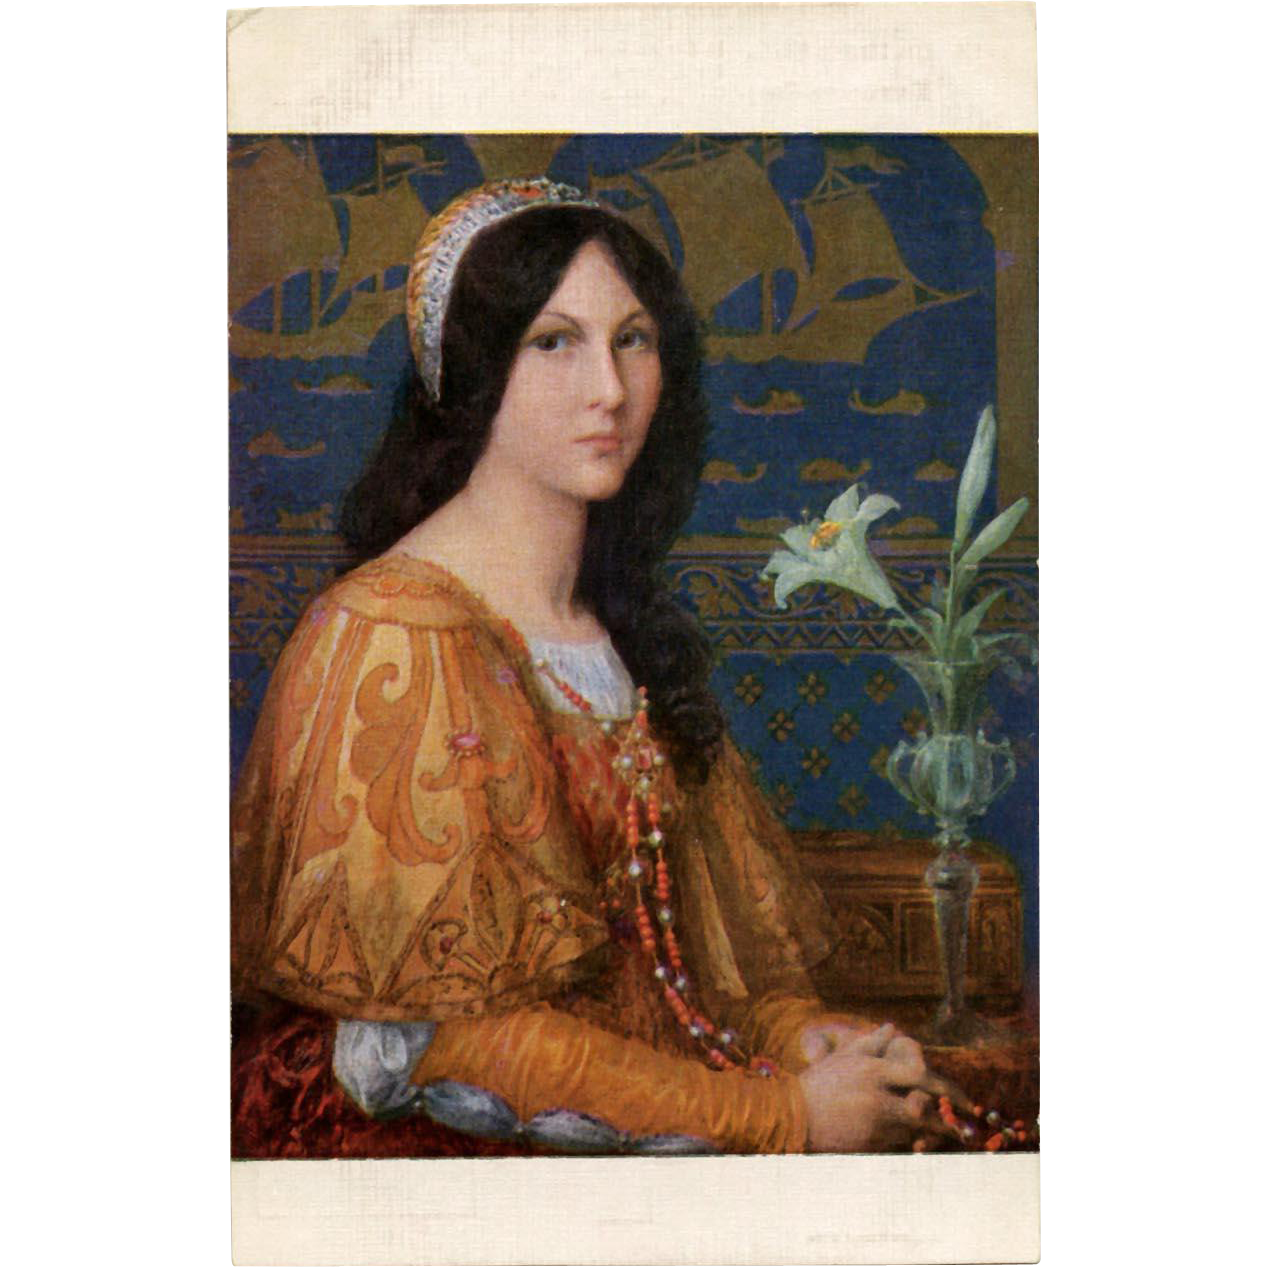 Elisabeth Sonrel Salon de Paris 1912 Daughter of the Doge Unused Antique French Postcard